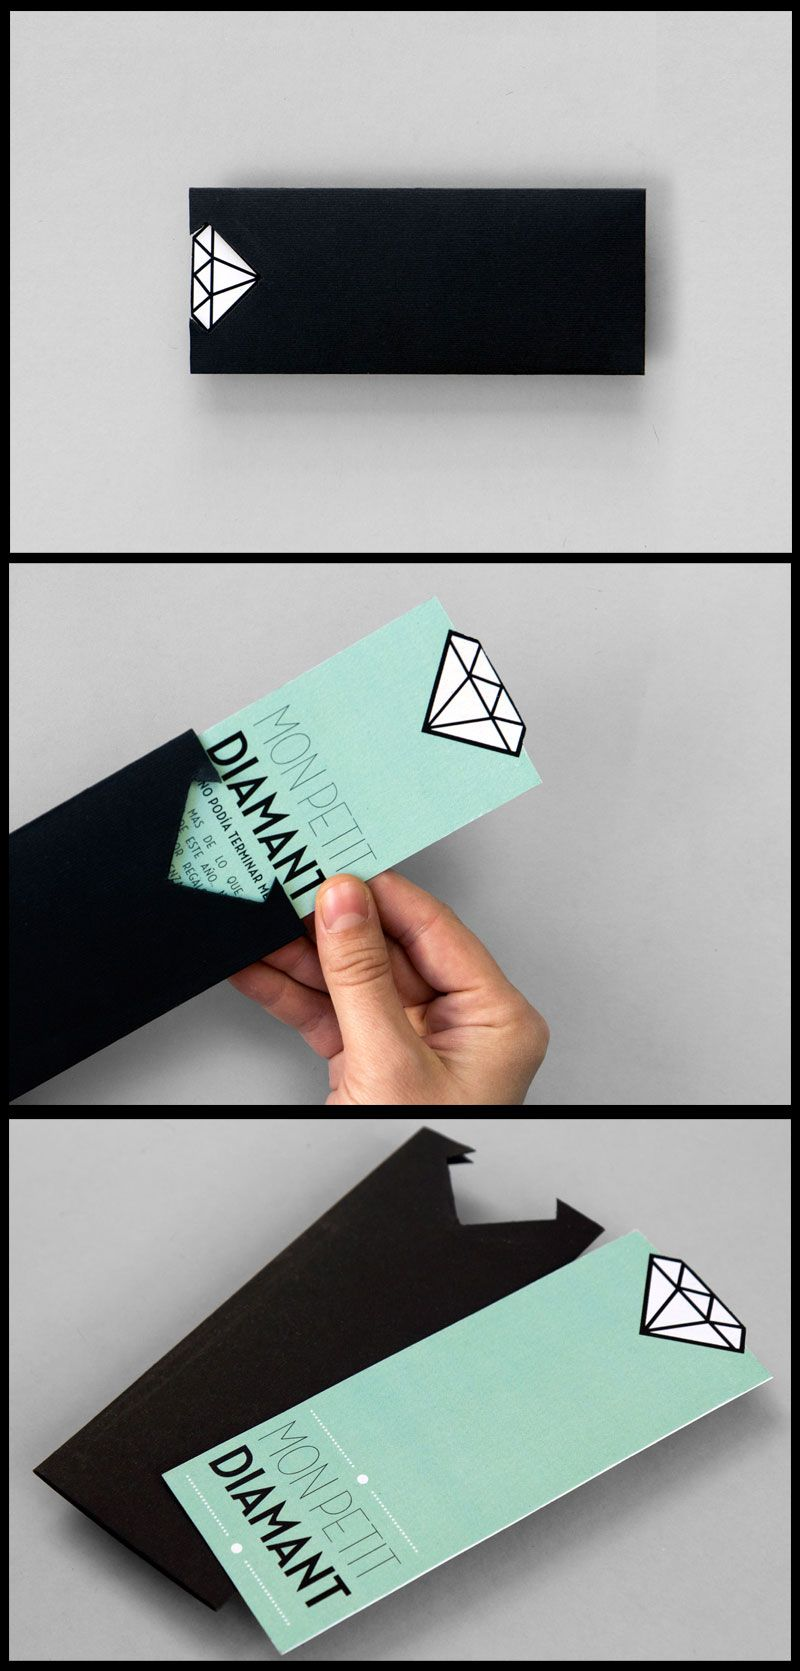 Pin By Qian Jiang On Gift Card Pinterest Gift Vouchers Gift